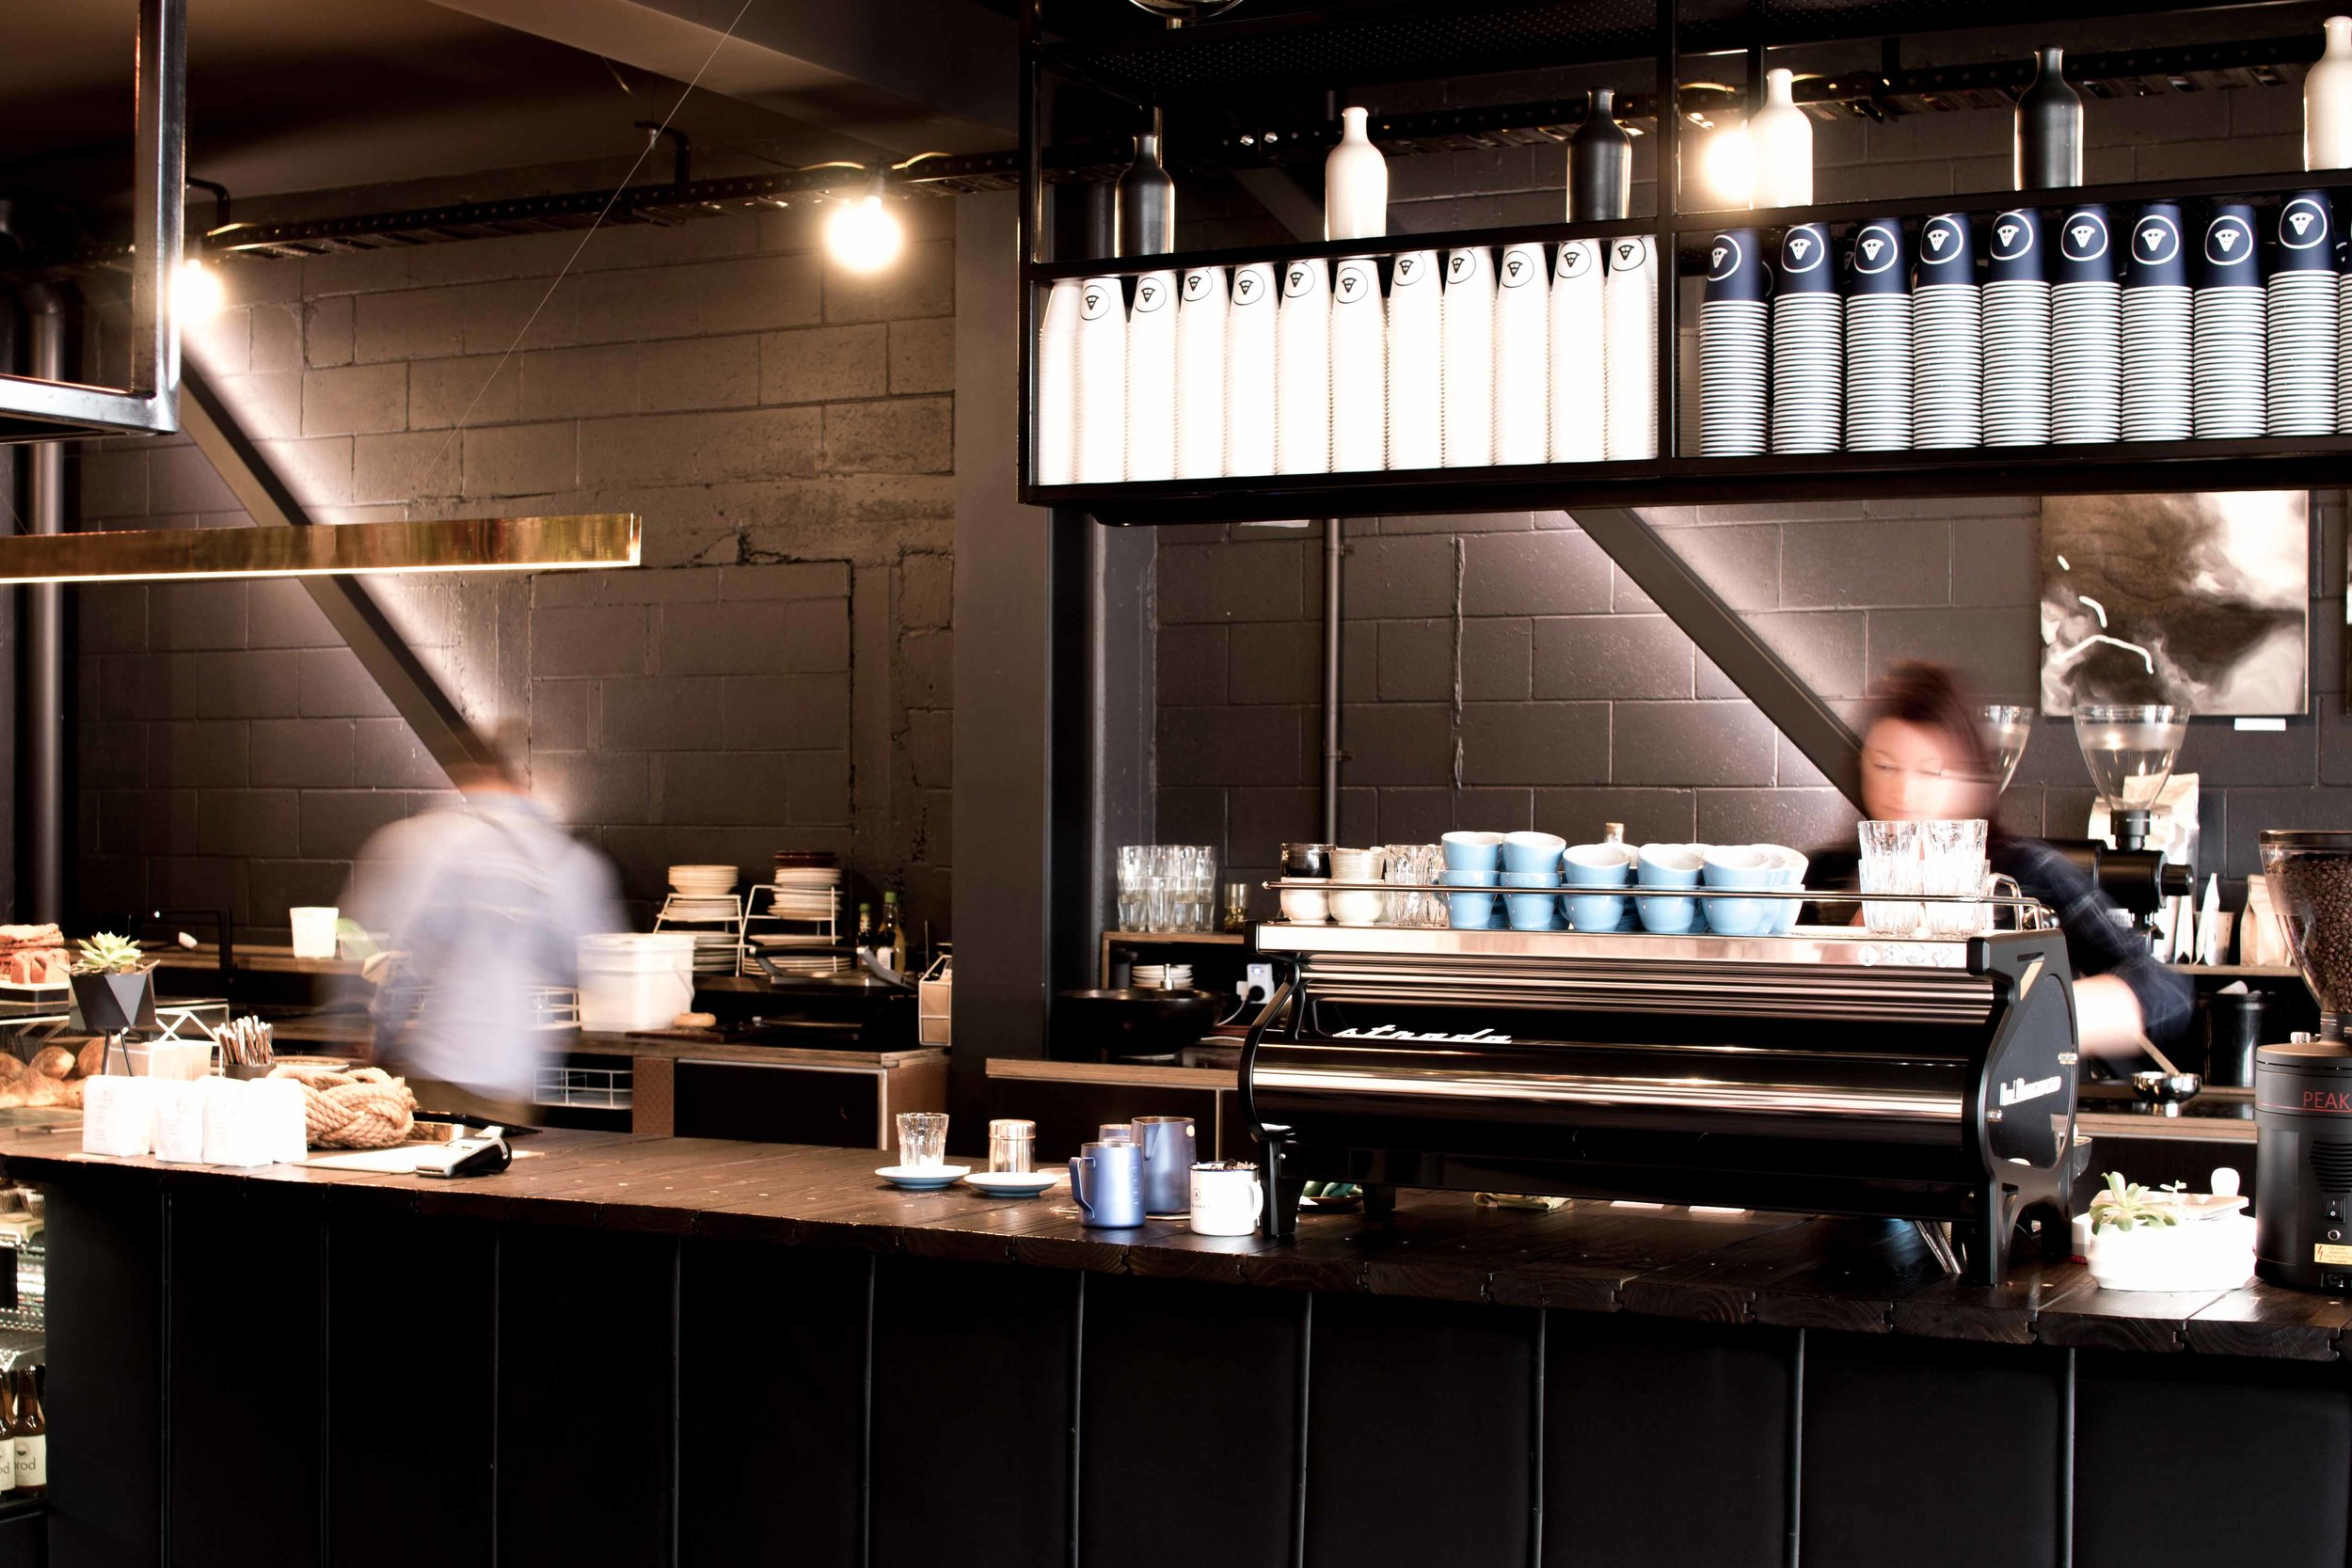 coffee-machine-2-low.jpg